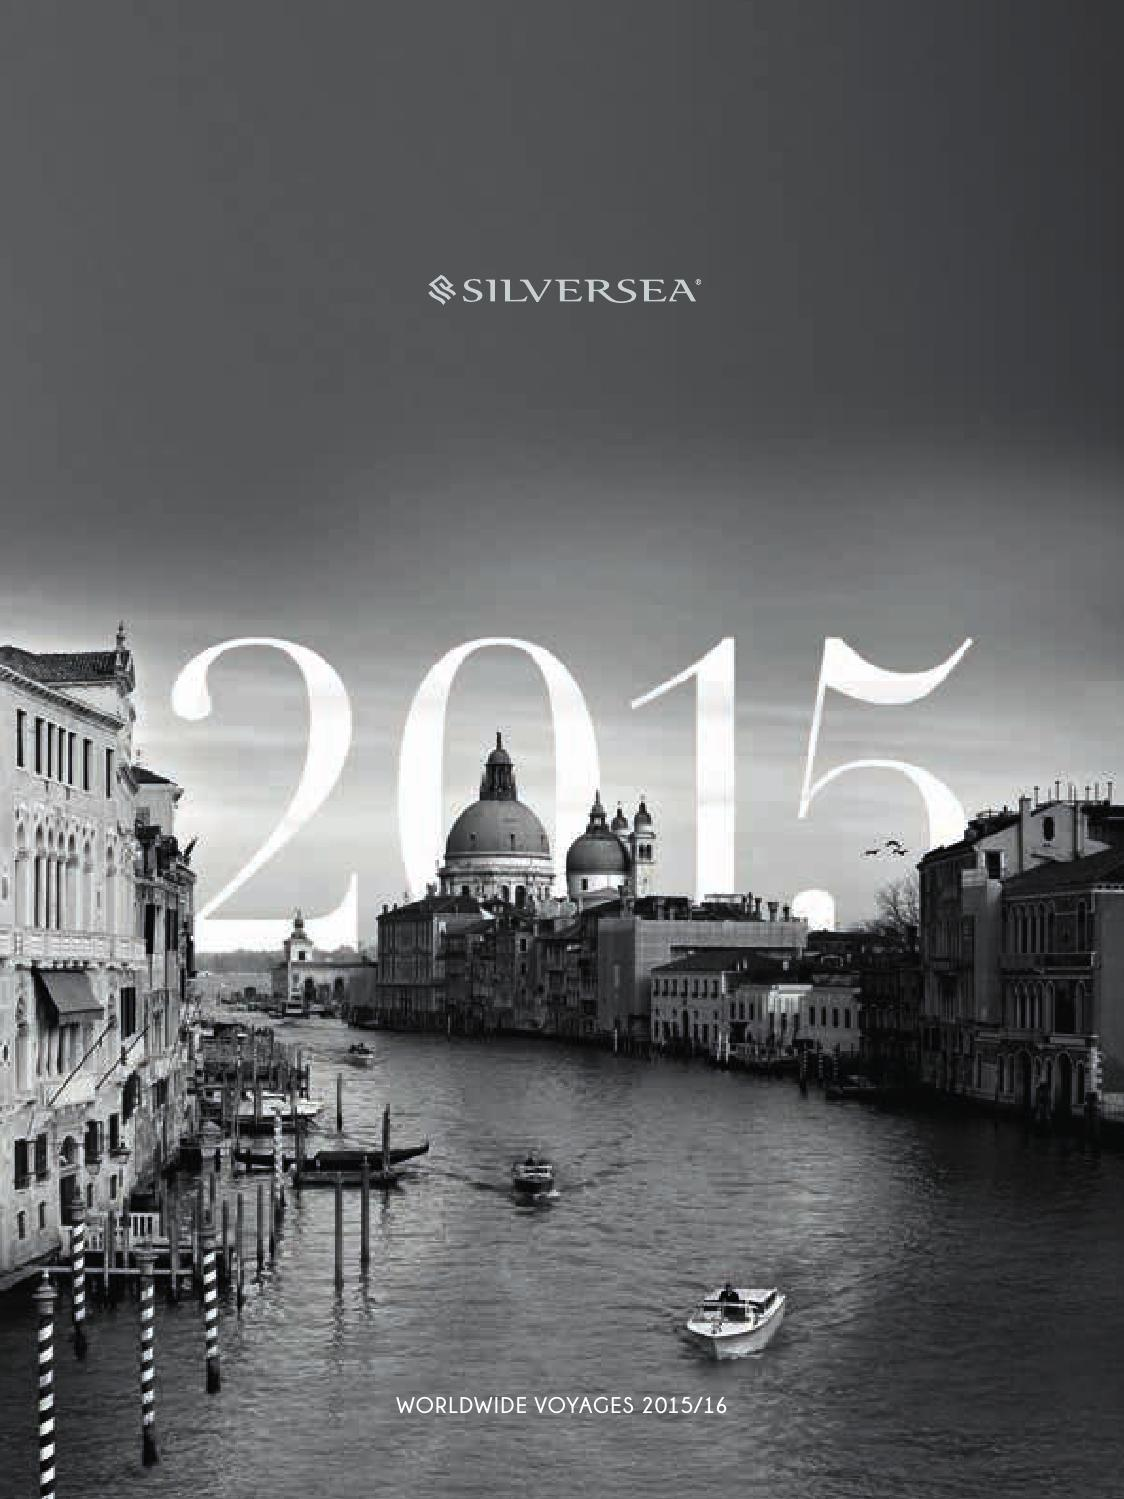 brochure 2015/16 germansilversea cruises - issuu